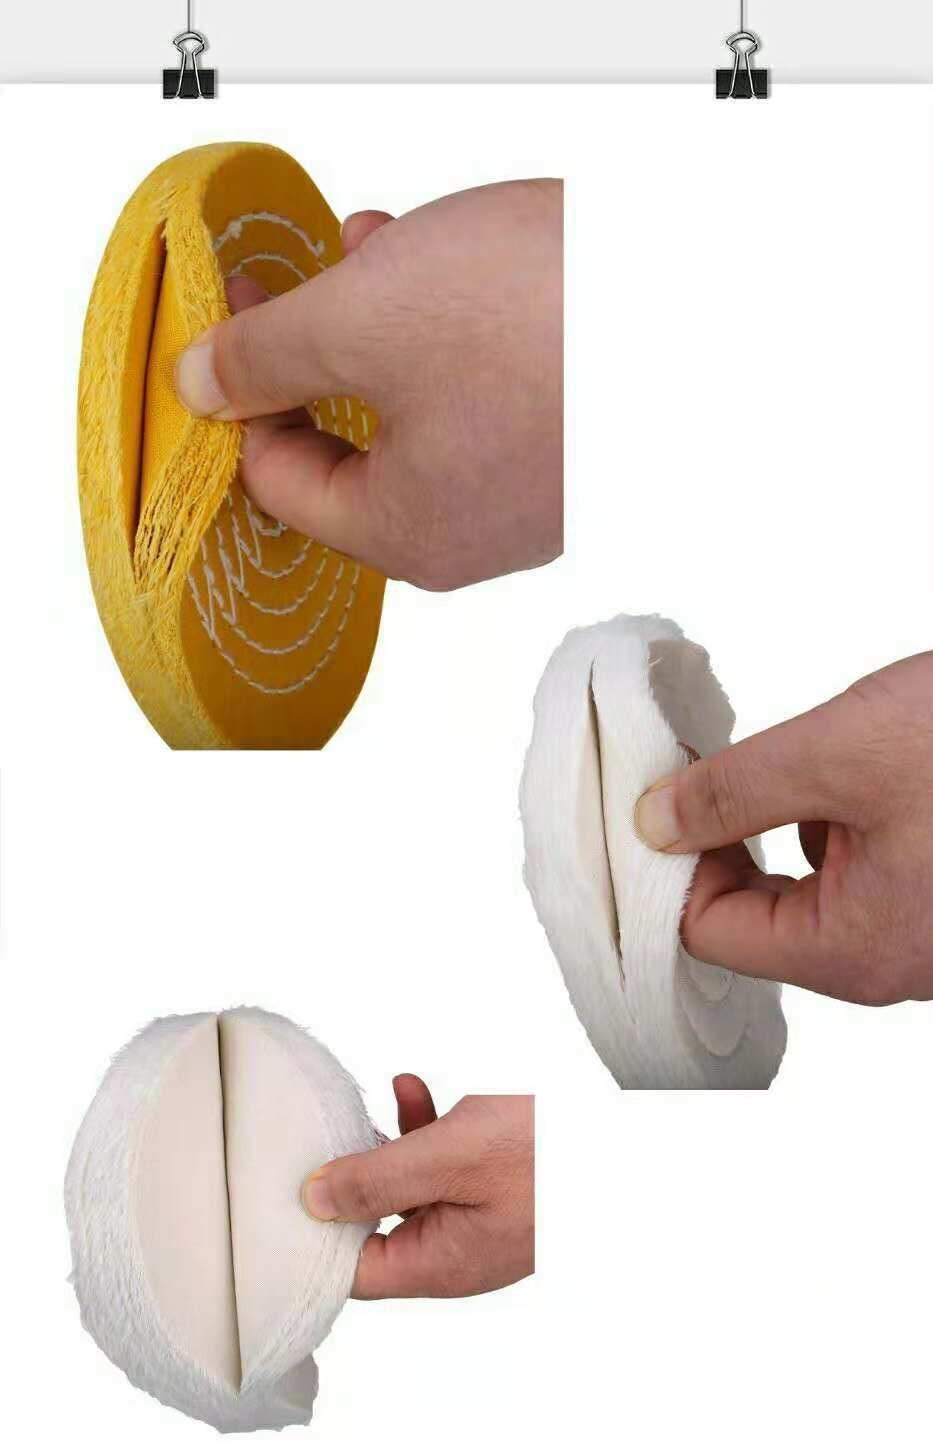 6 inch Buffing Polishing wheel 1/2 Inch Arbor Hole for Bench Grinder Buffer Tool Coarse Medium Soft 3pcs